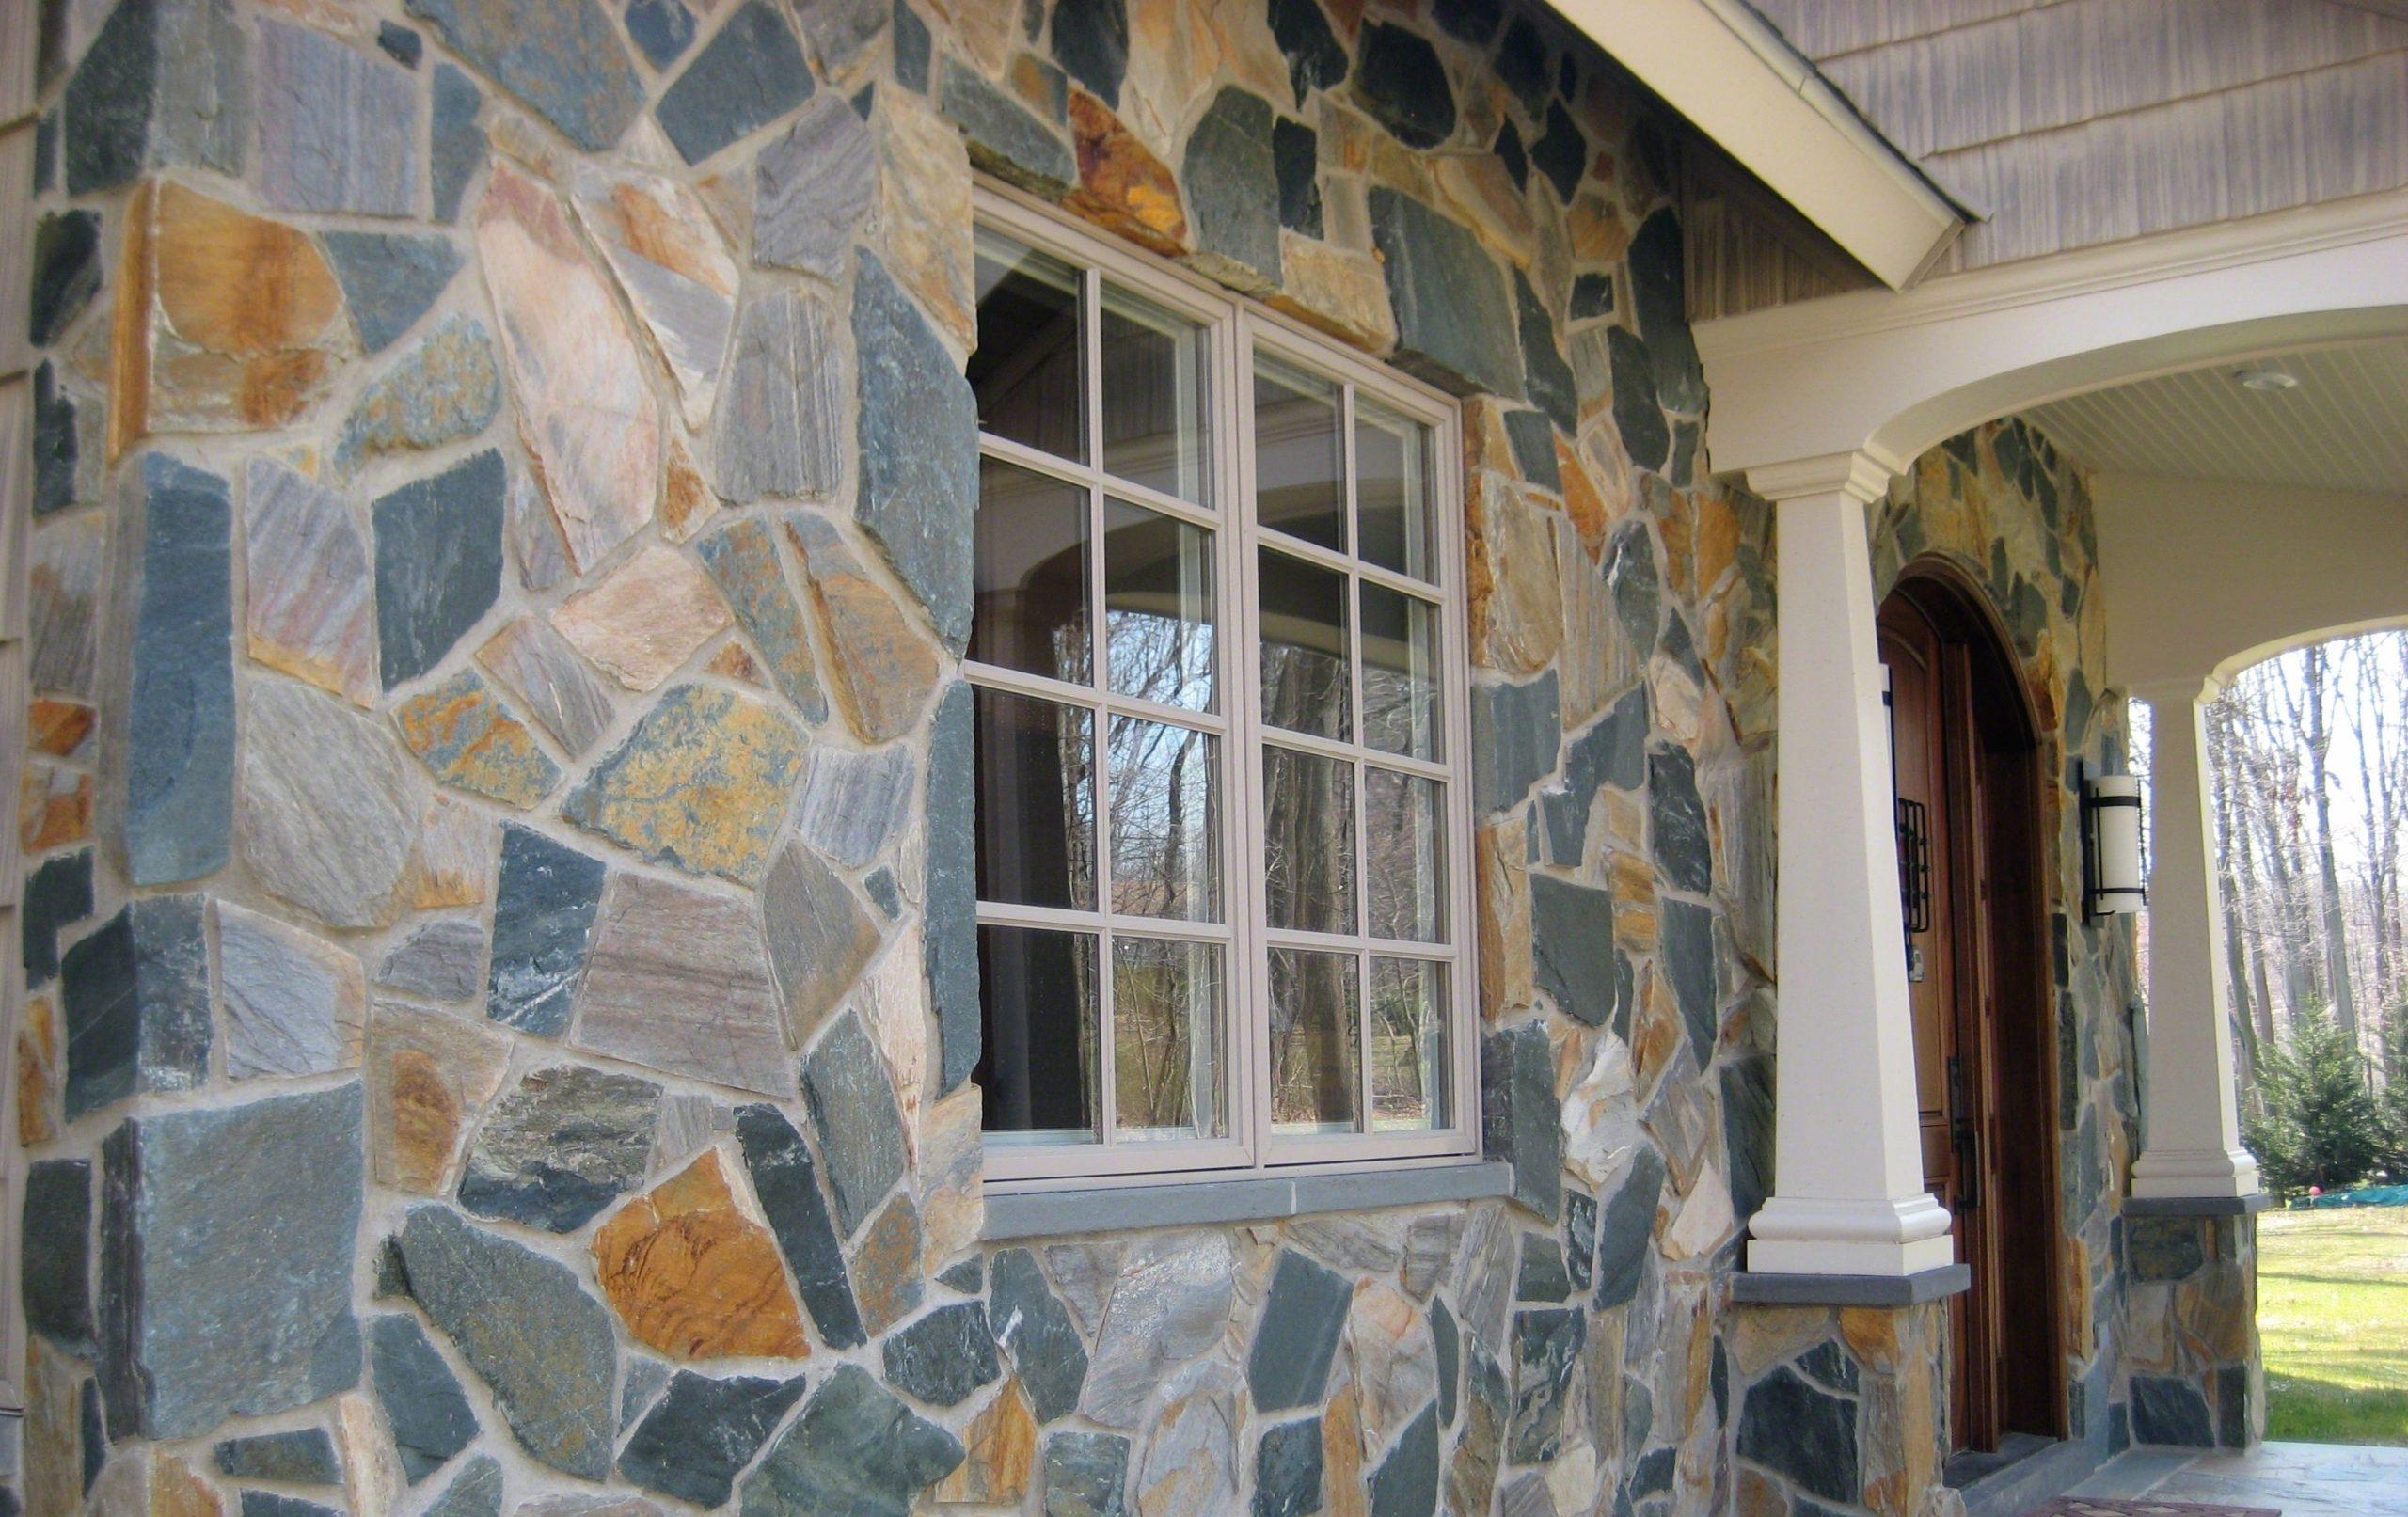 Newport Mosaic Natural Thin Stone Veneer Exterior Masonry